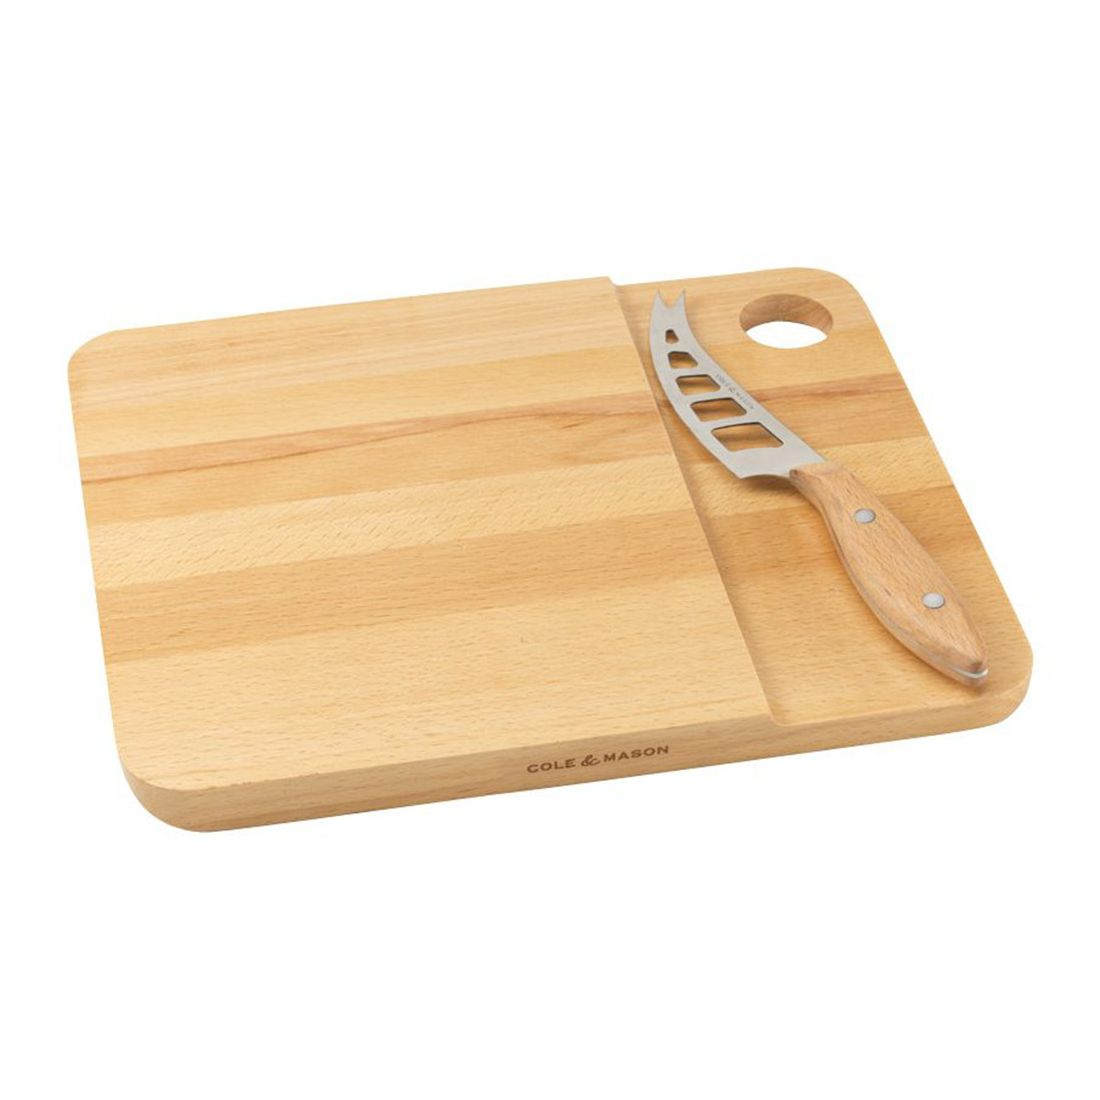 Cole & Mason Universal Cheese Knife & Board